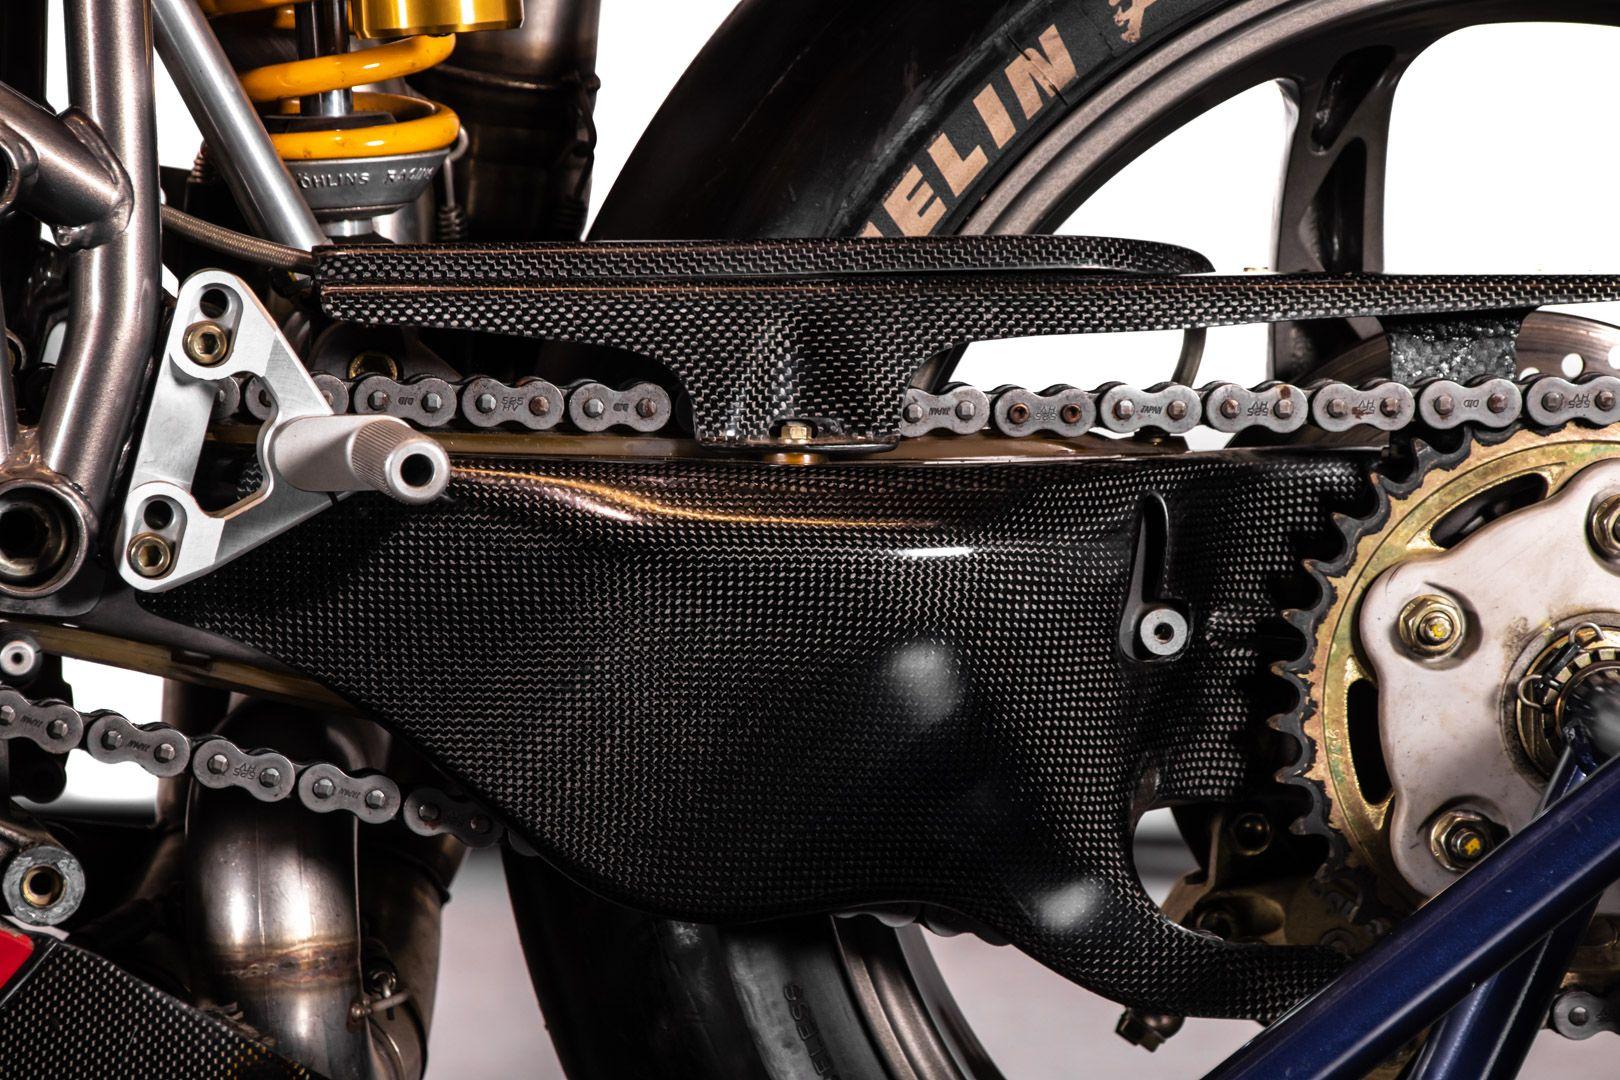 2008 Ducati 996 Fogarty Evocation 03/12 84214